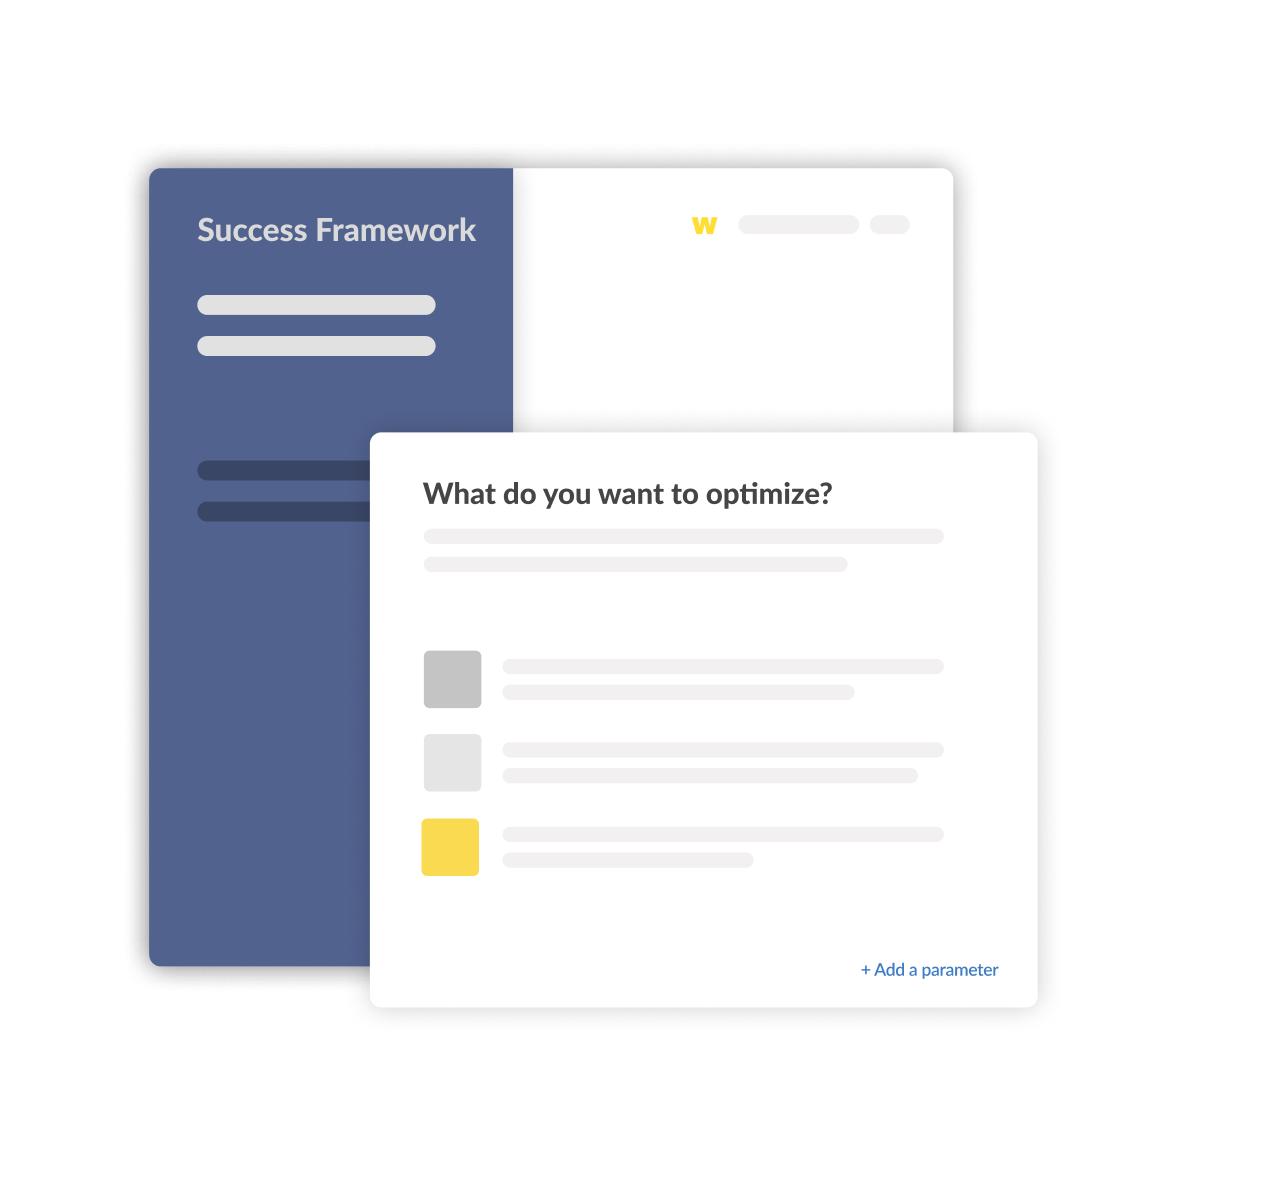 OKR Success Framework